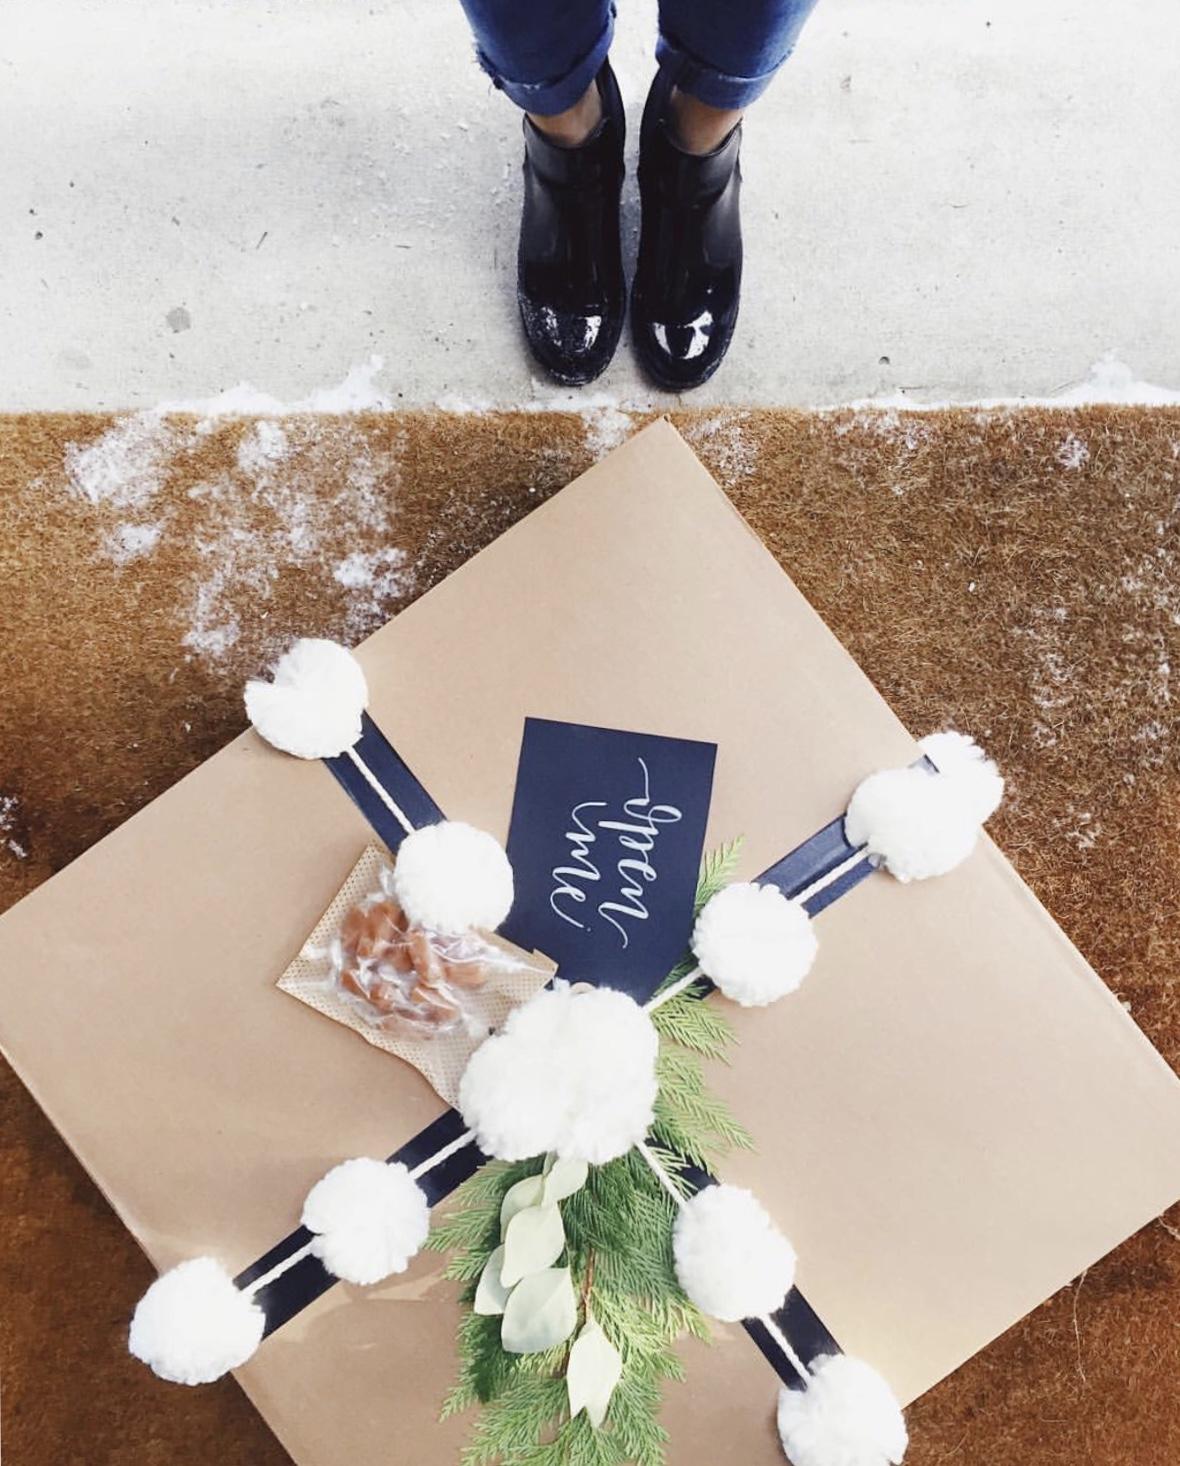 Nyla Free Designs, Christmas Gift 2018, Calgary Interior Designer